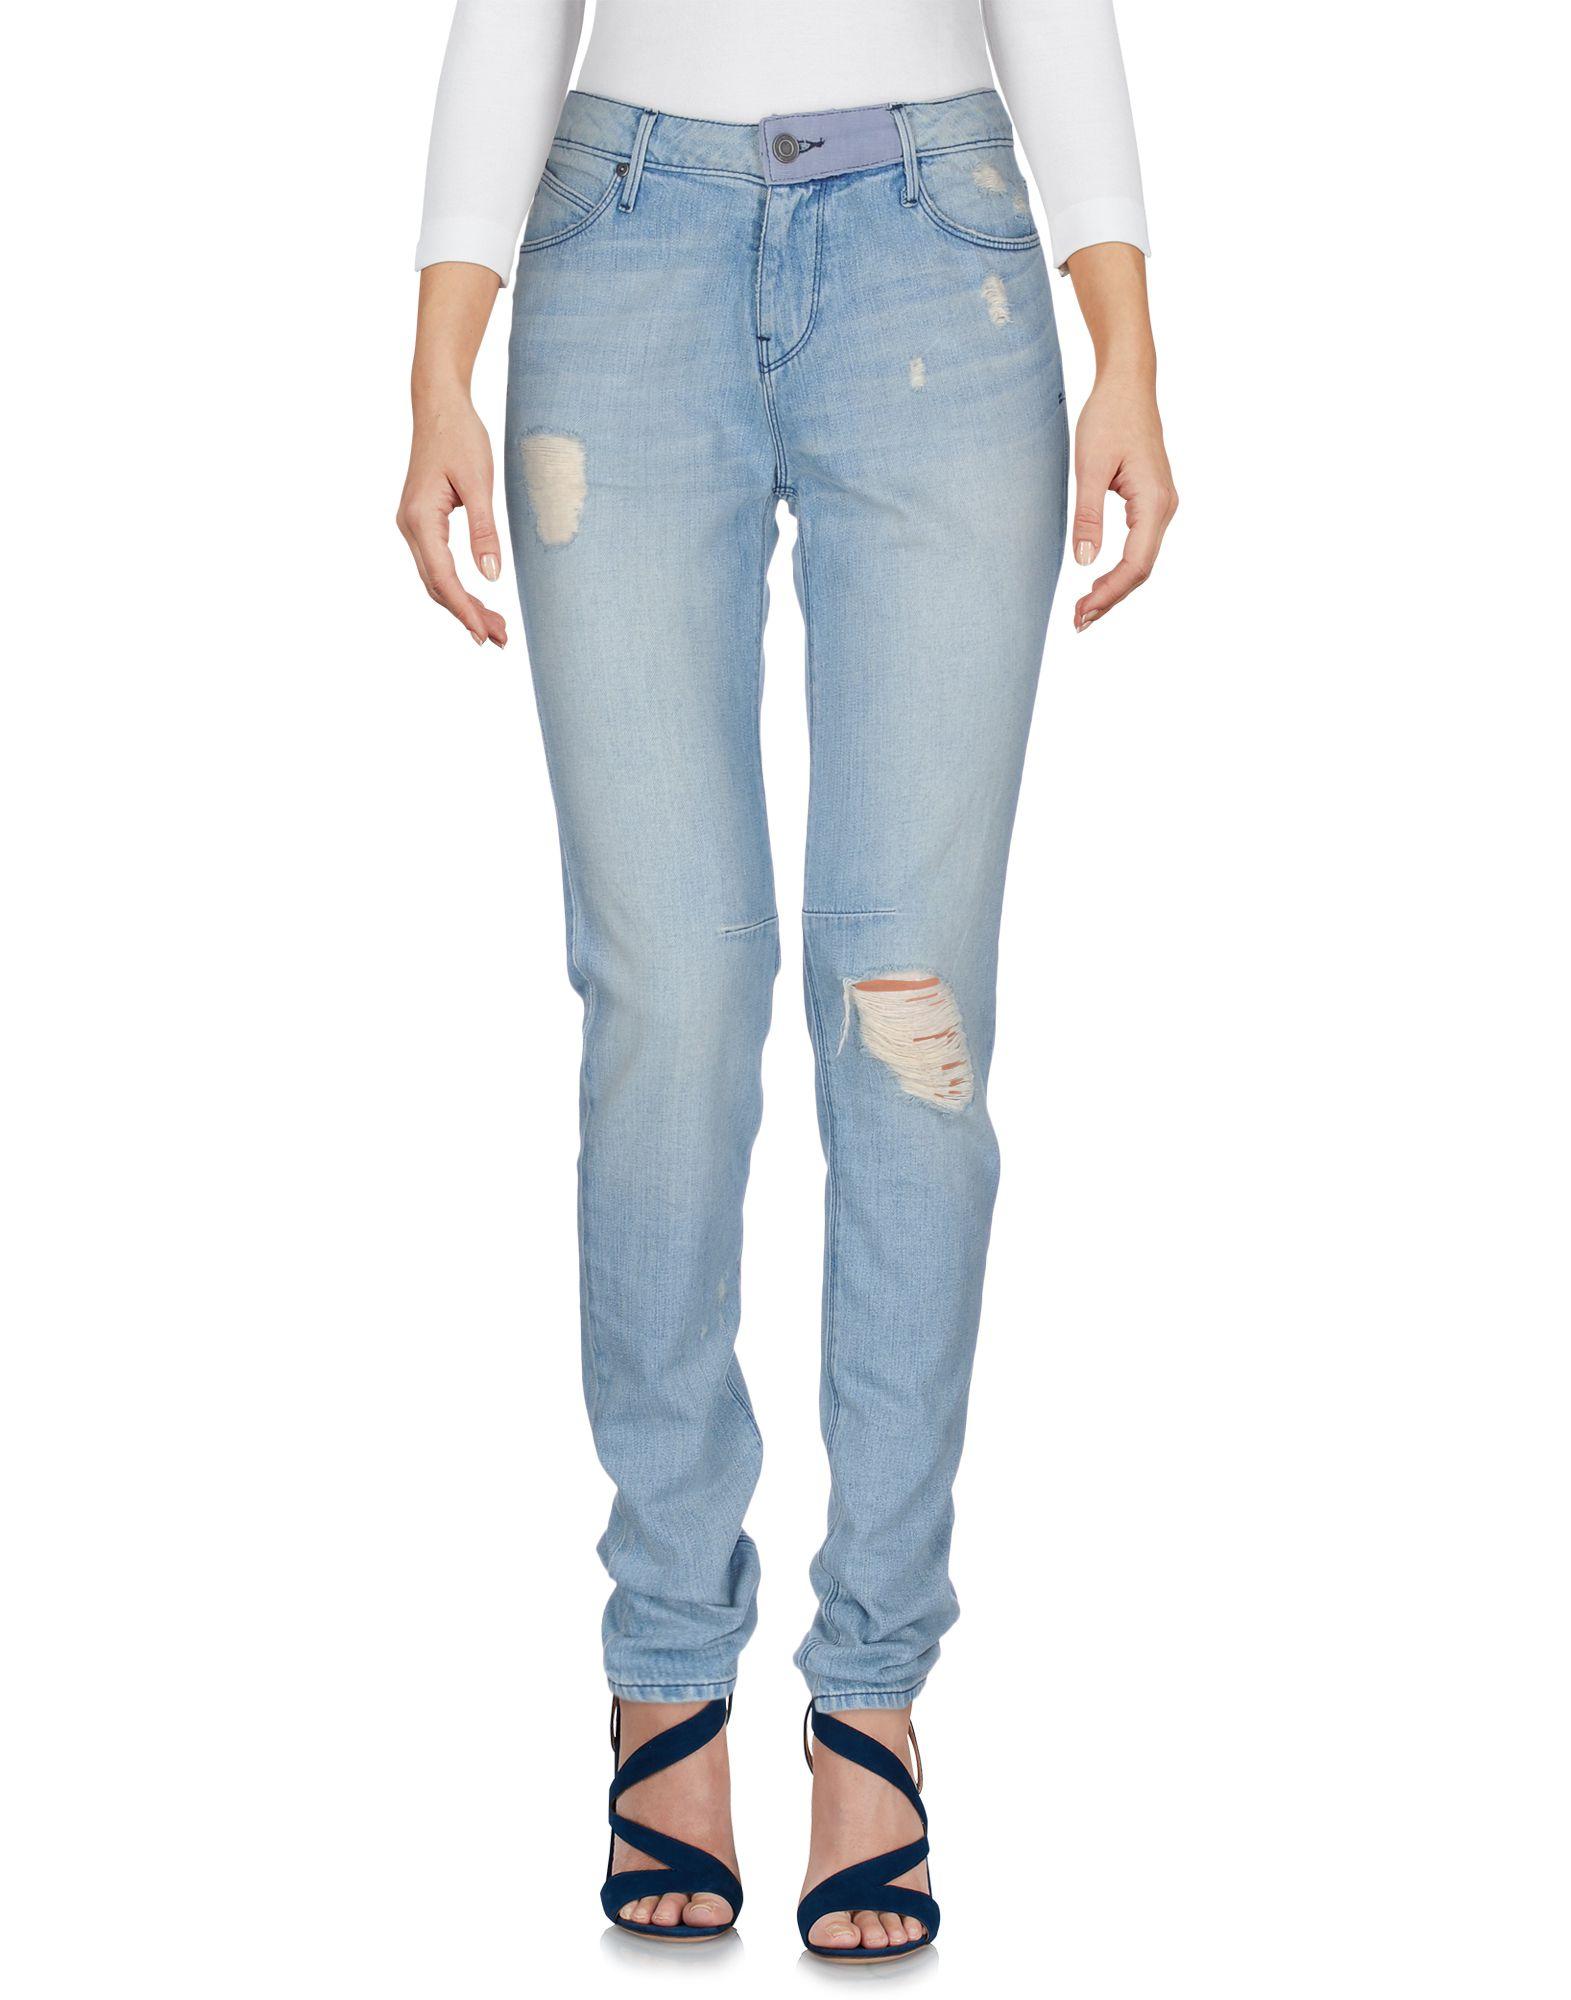 RTA Damen Jeanshose Farbe Blau Größe 4 - broschei